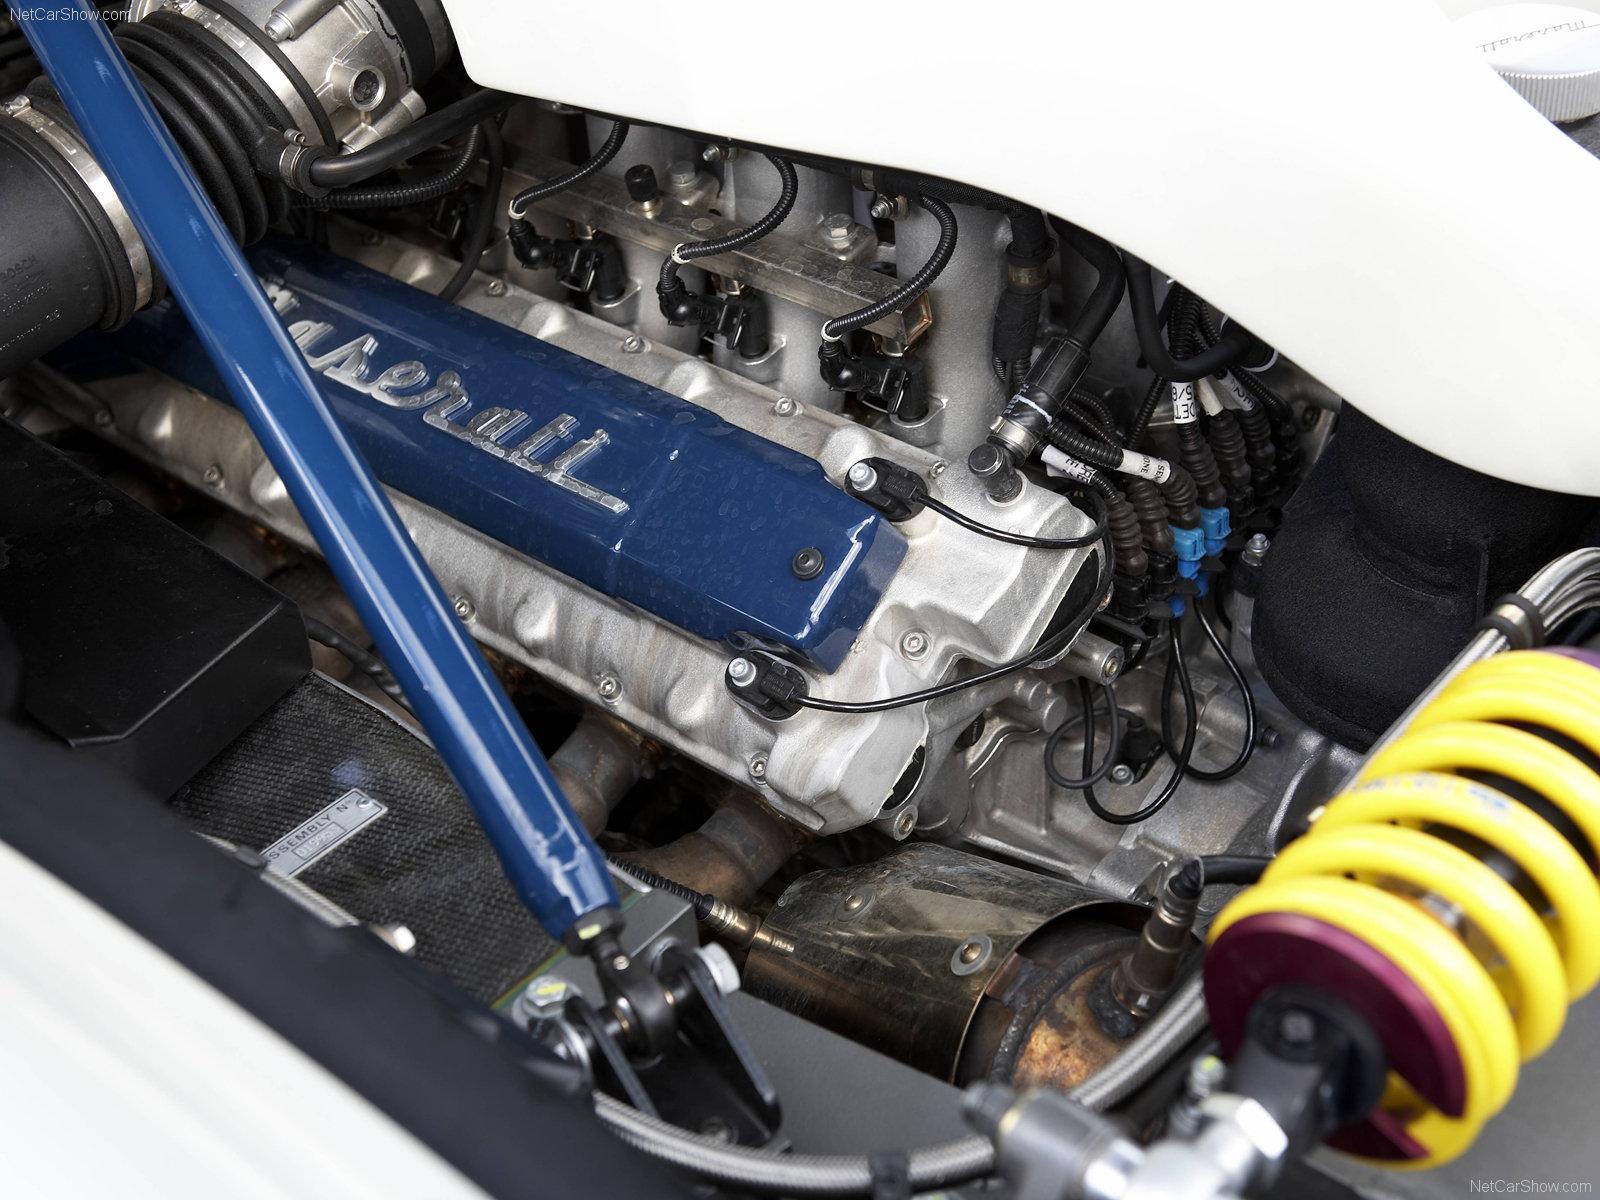 Hình ảnh siêu xe Edo Maserati MC12 R 2005 & nội ngoại thất